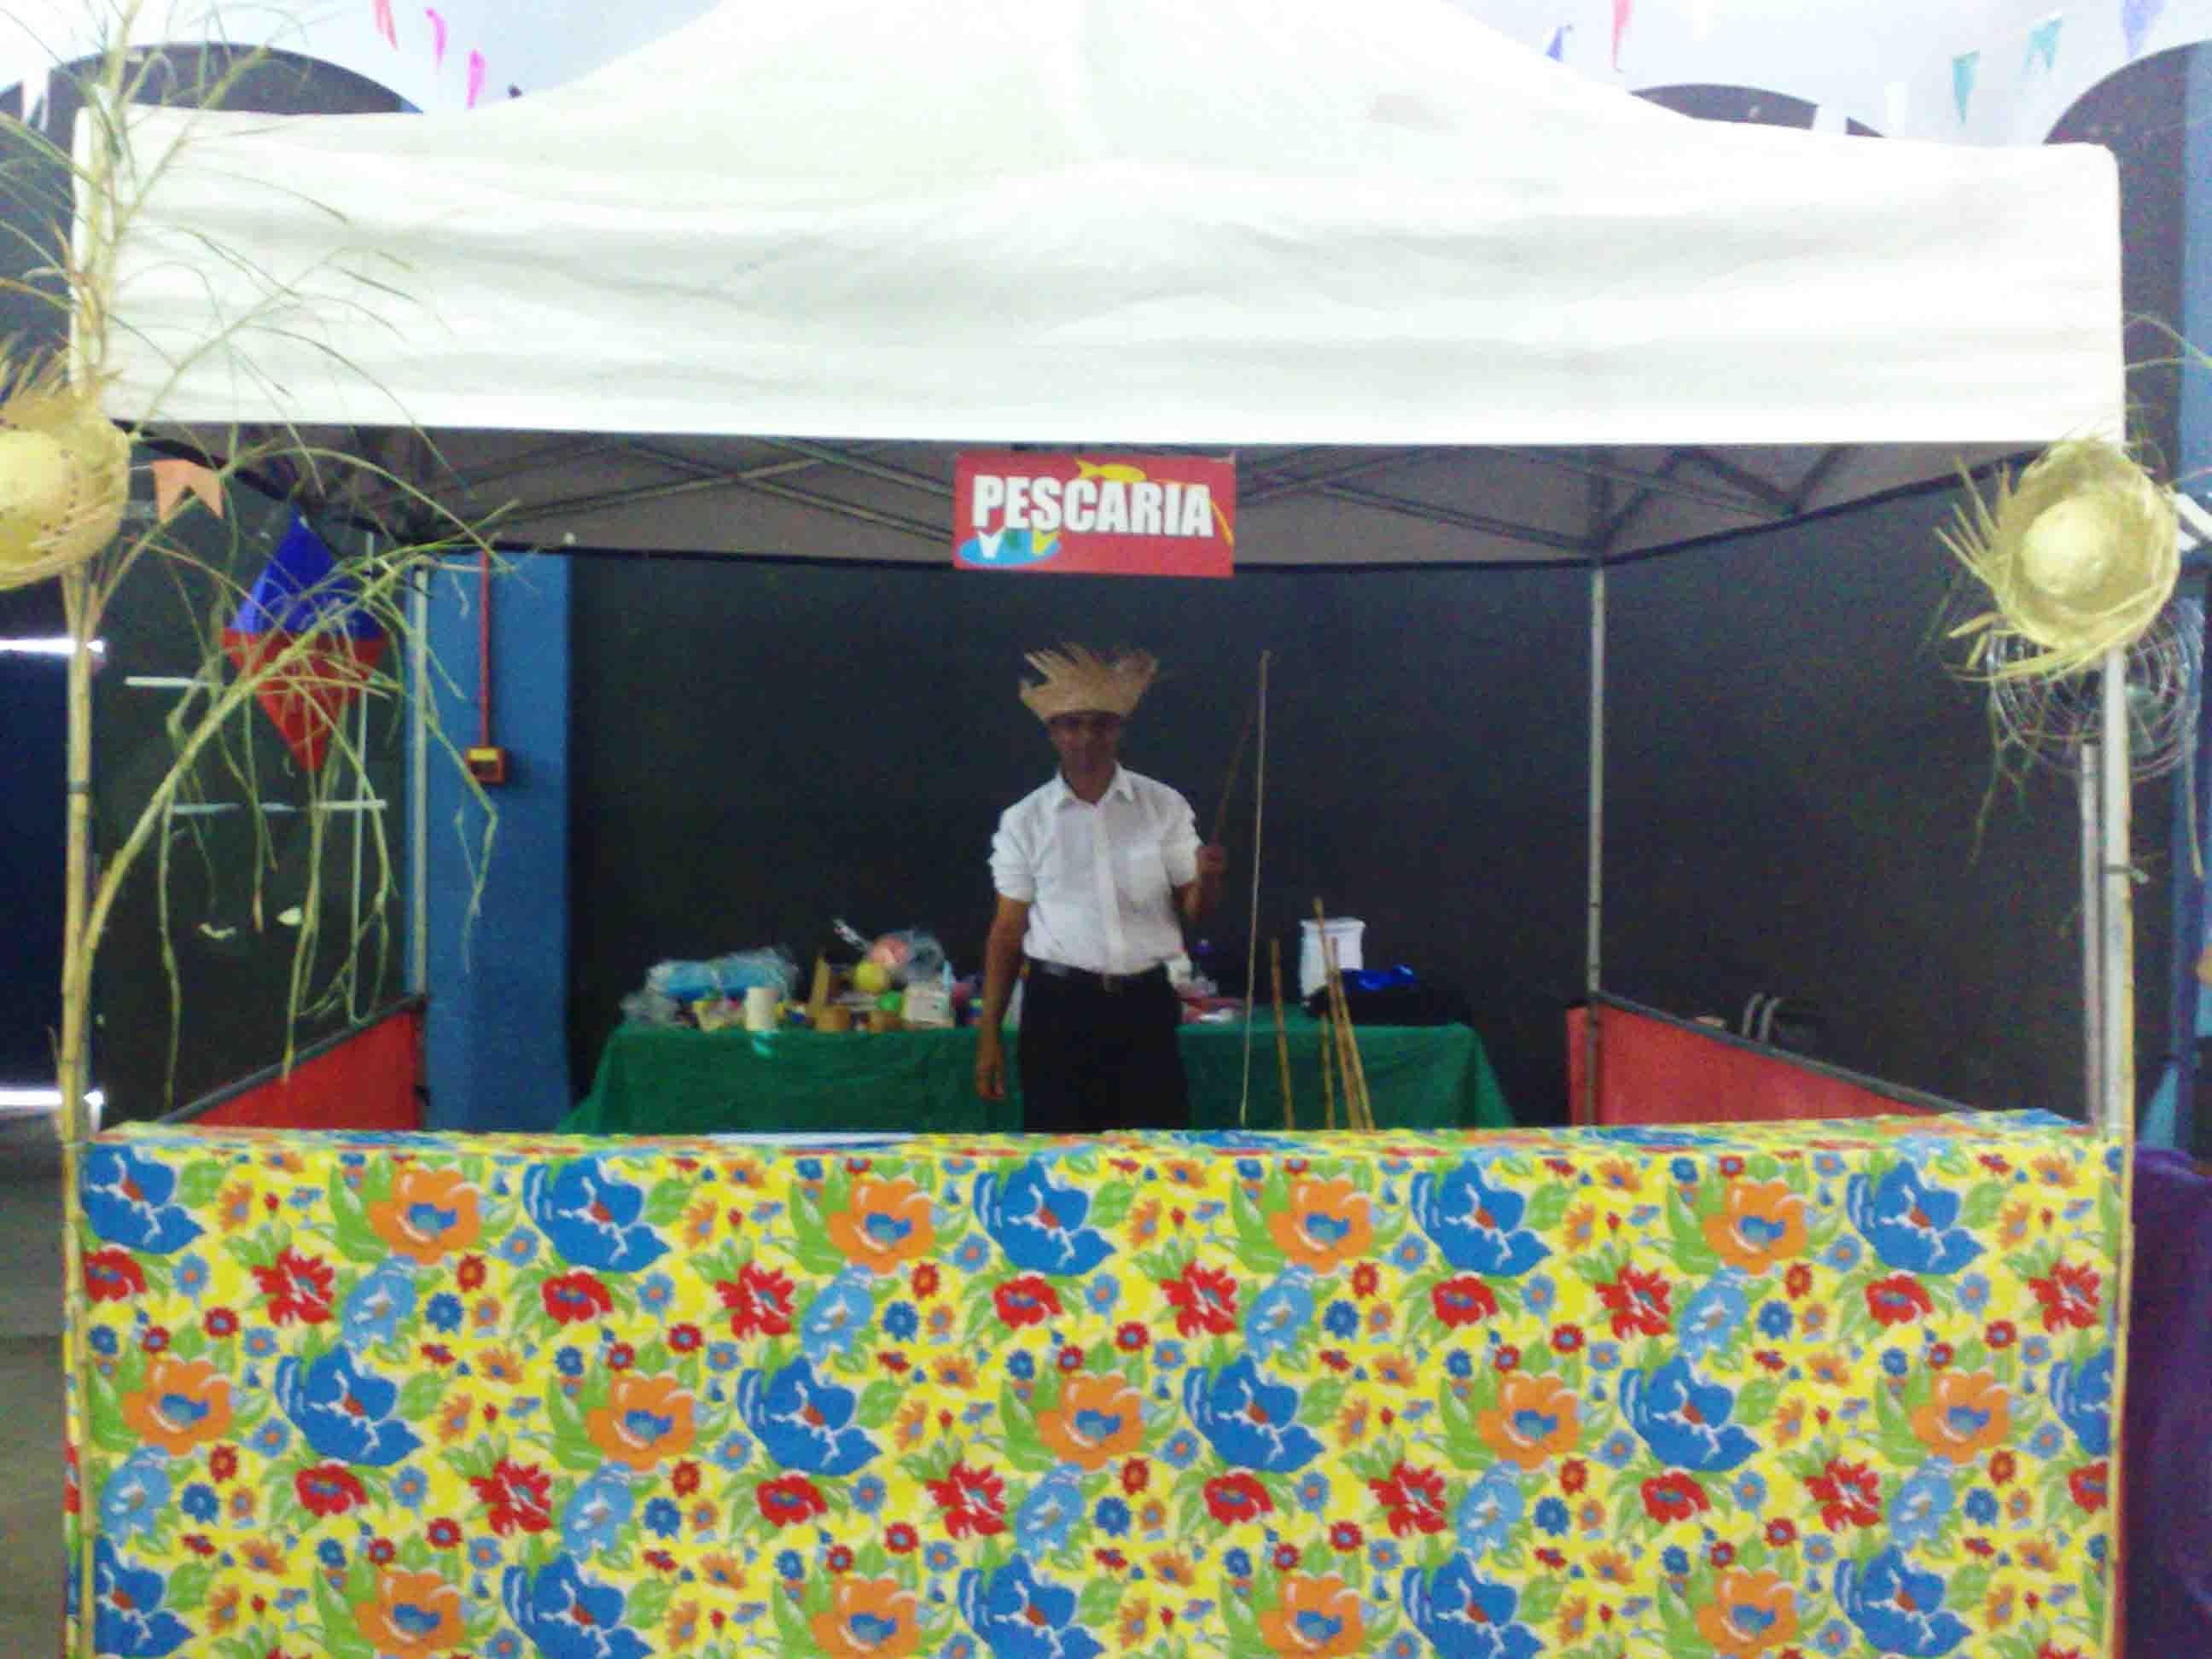 Barraca+de+Pescaria+-+Festa+Junina